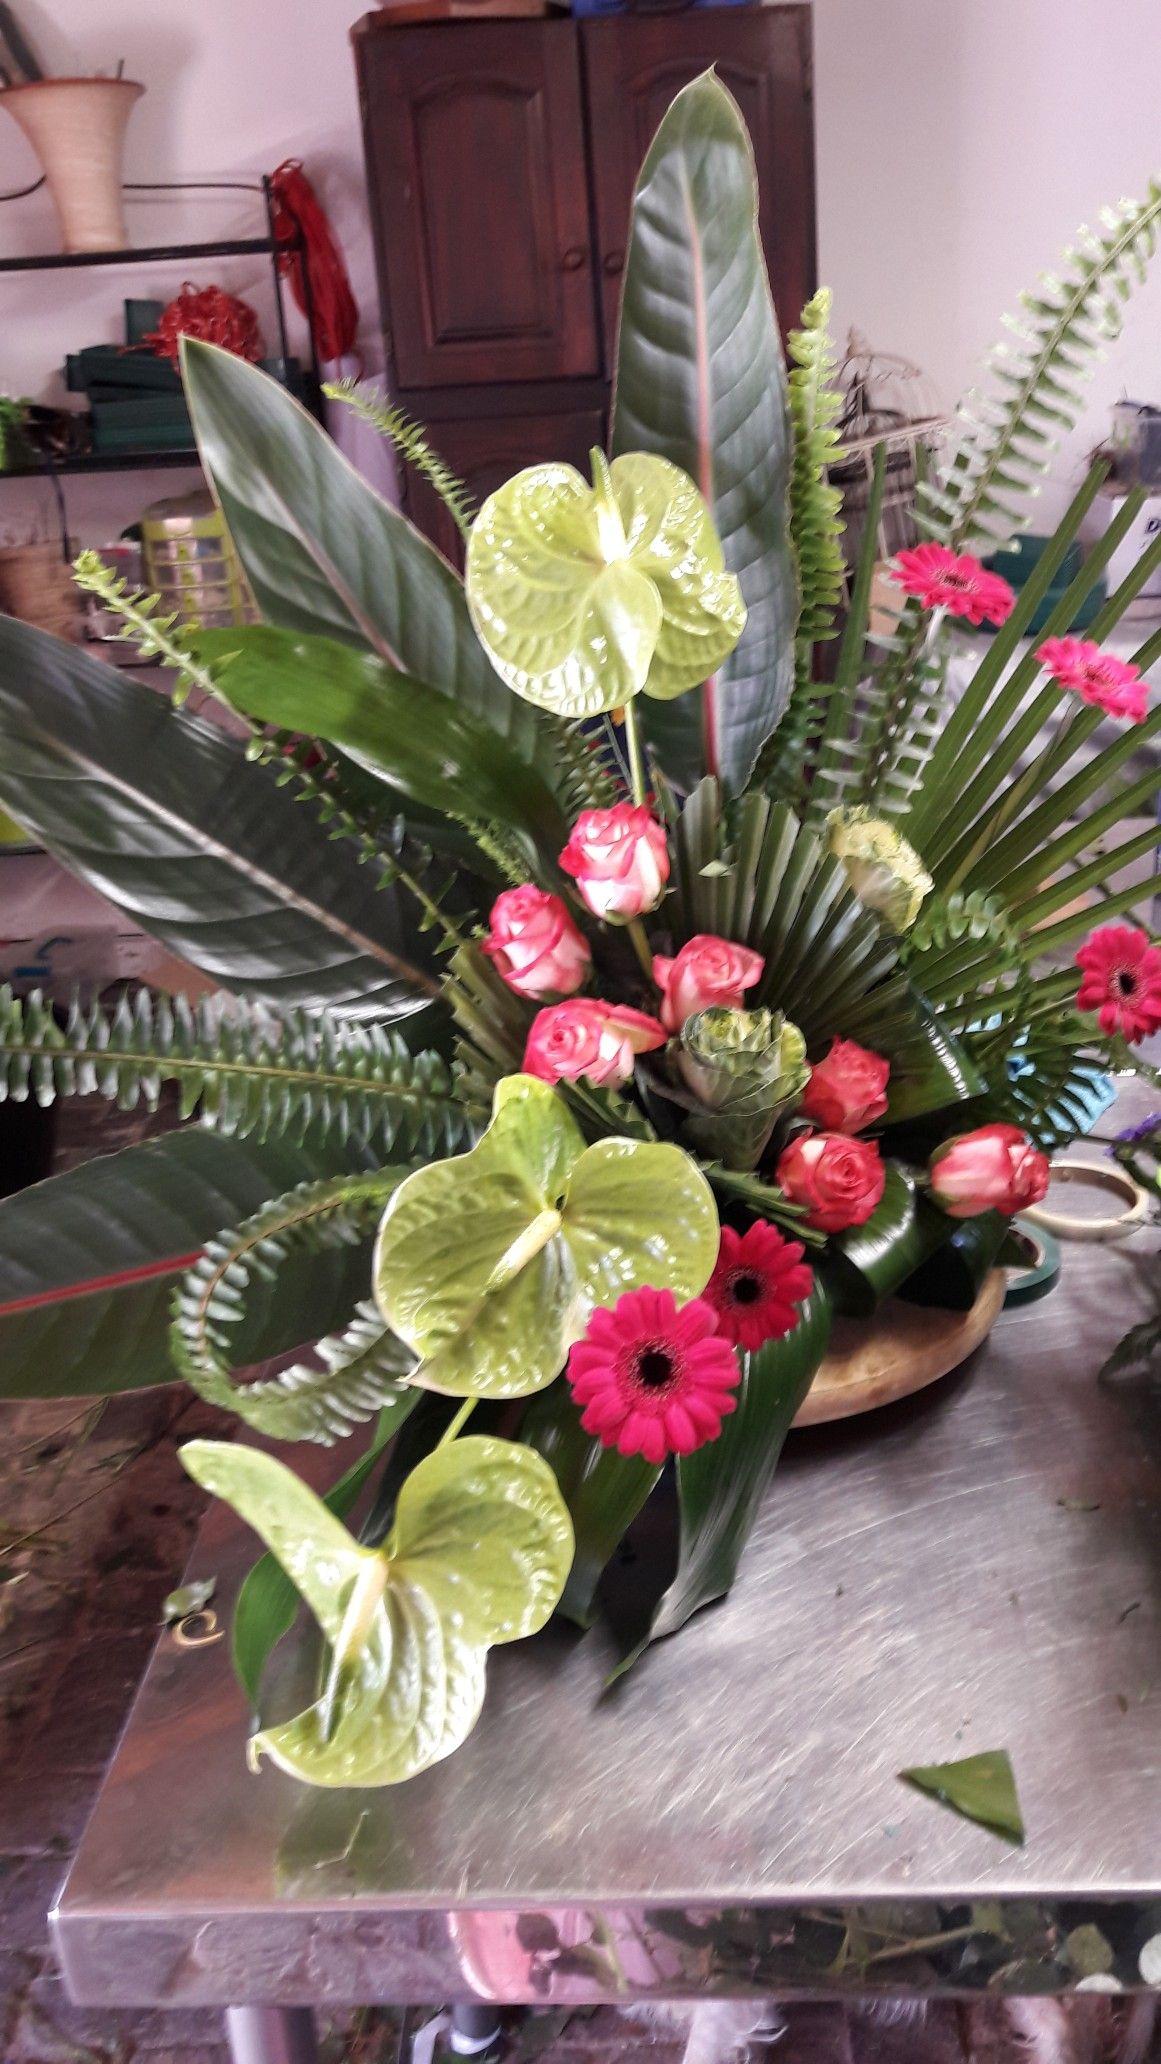 Pin de Jenny Stander em National Floristry Training Institute